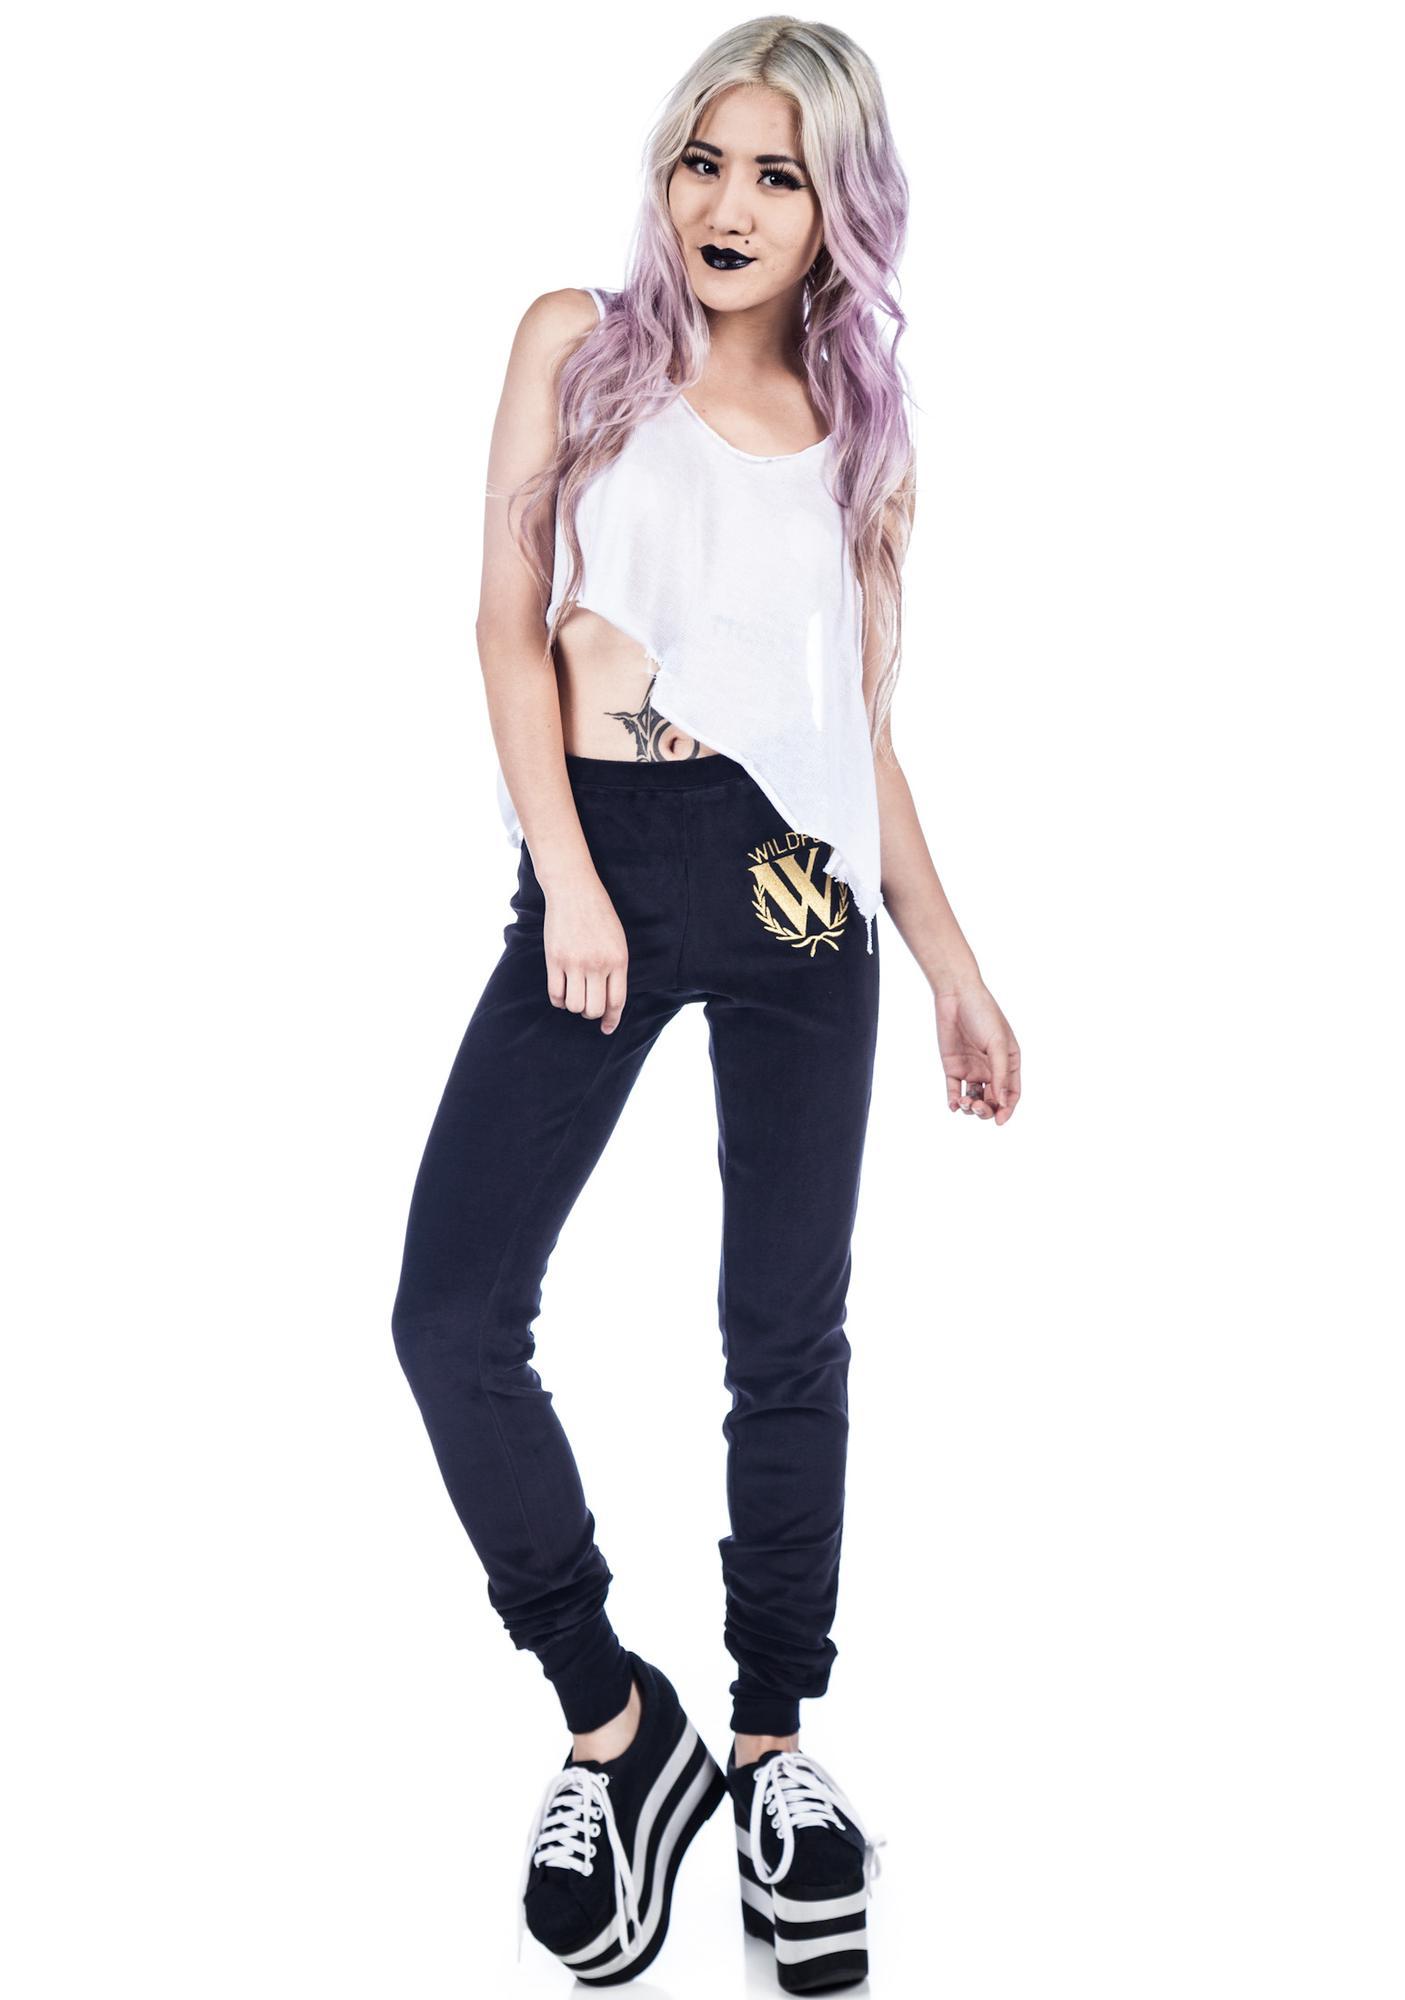 Wildfox Couture Juliet Leggings